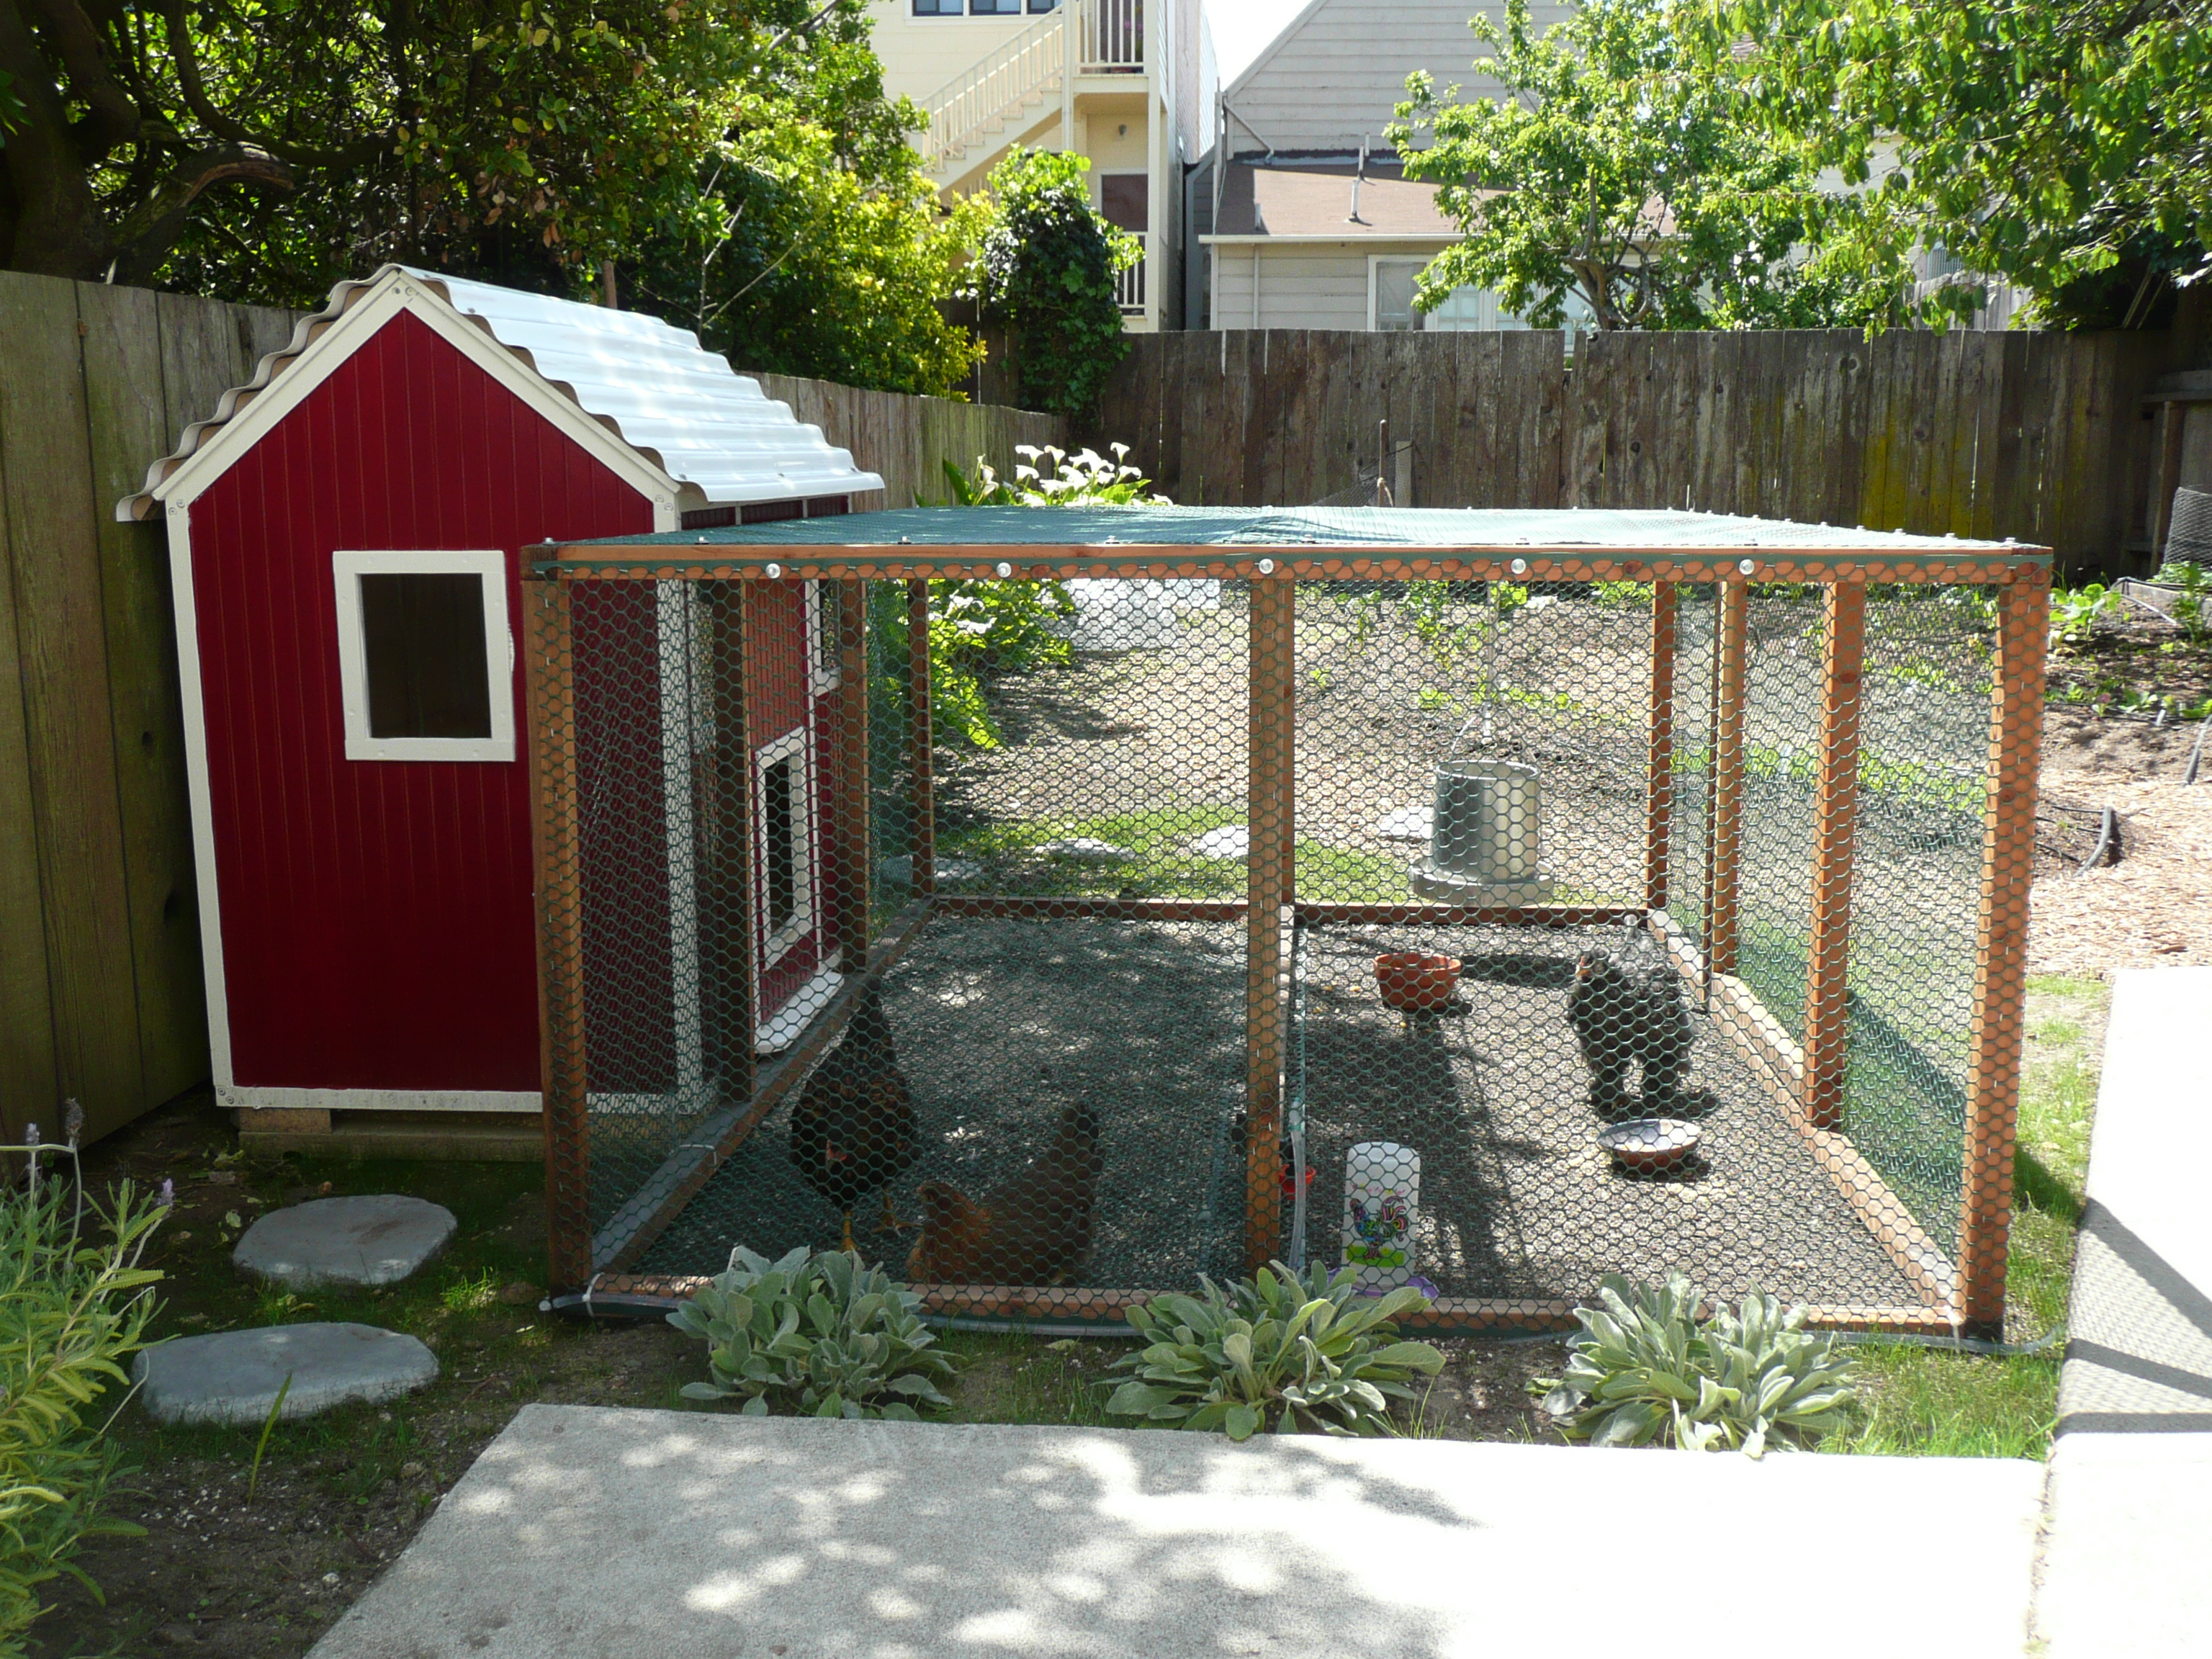 Picture of Urban Farming: Raising Backyard Chickens